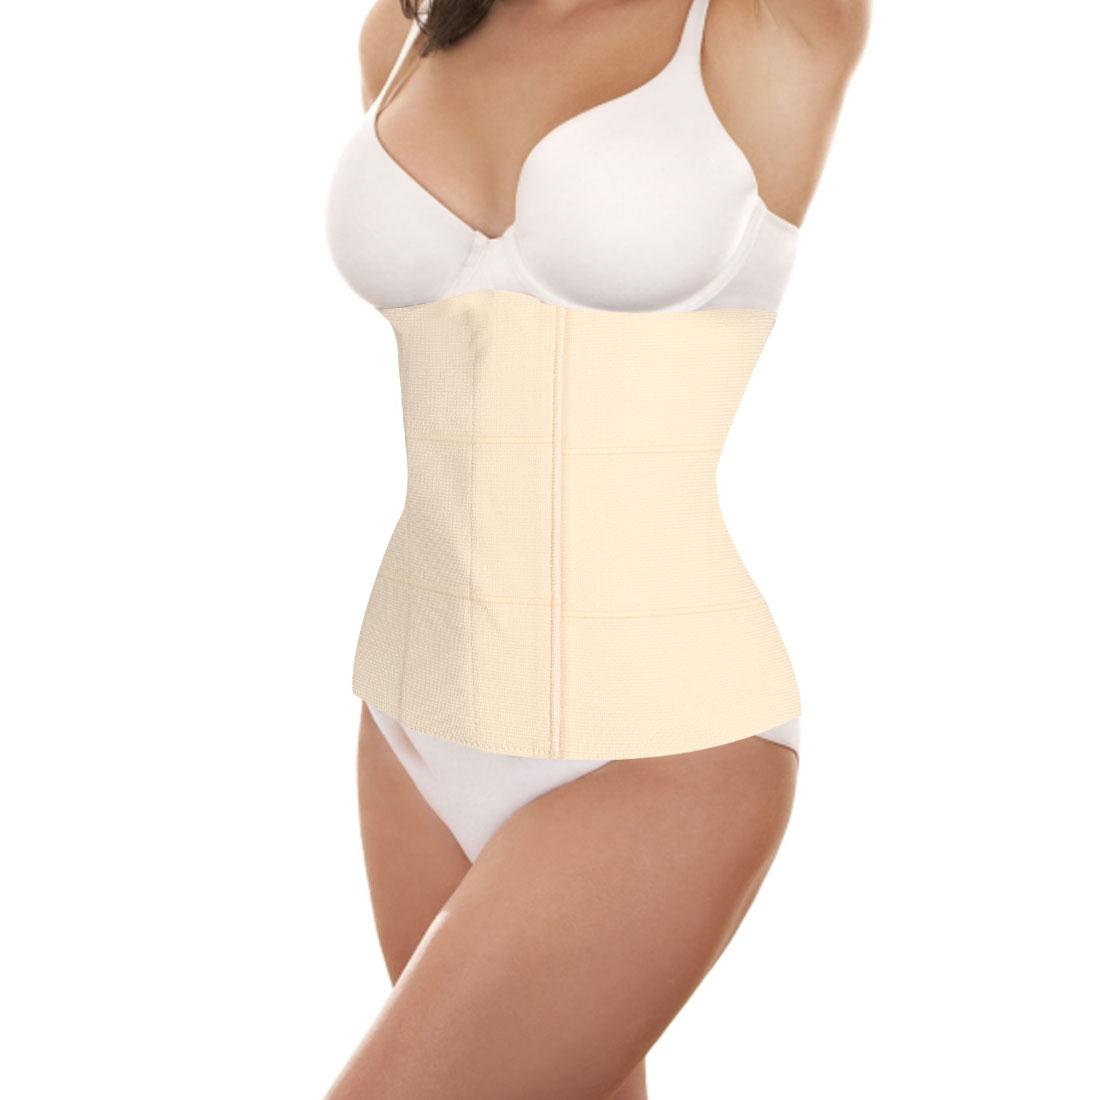 Woman Shapewear Tummy Slimmer Girdle Corset Control Waist Cincher Beige XS